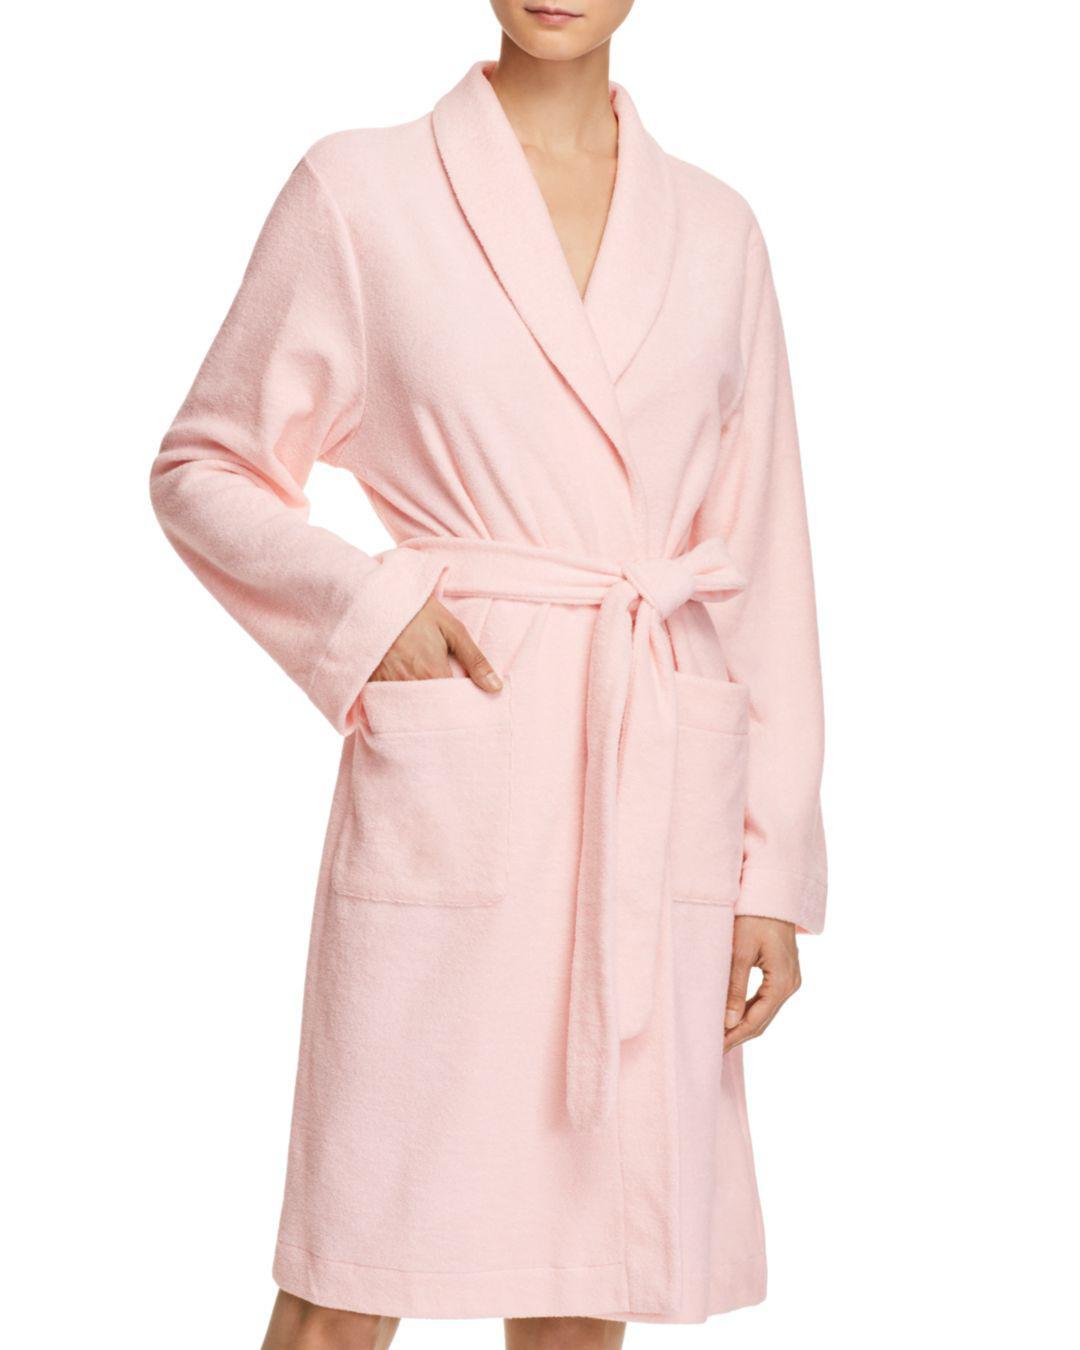 Lyst - Hanro Plush Wrap Robe in Pink fdfa0cffe